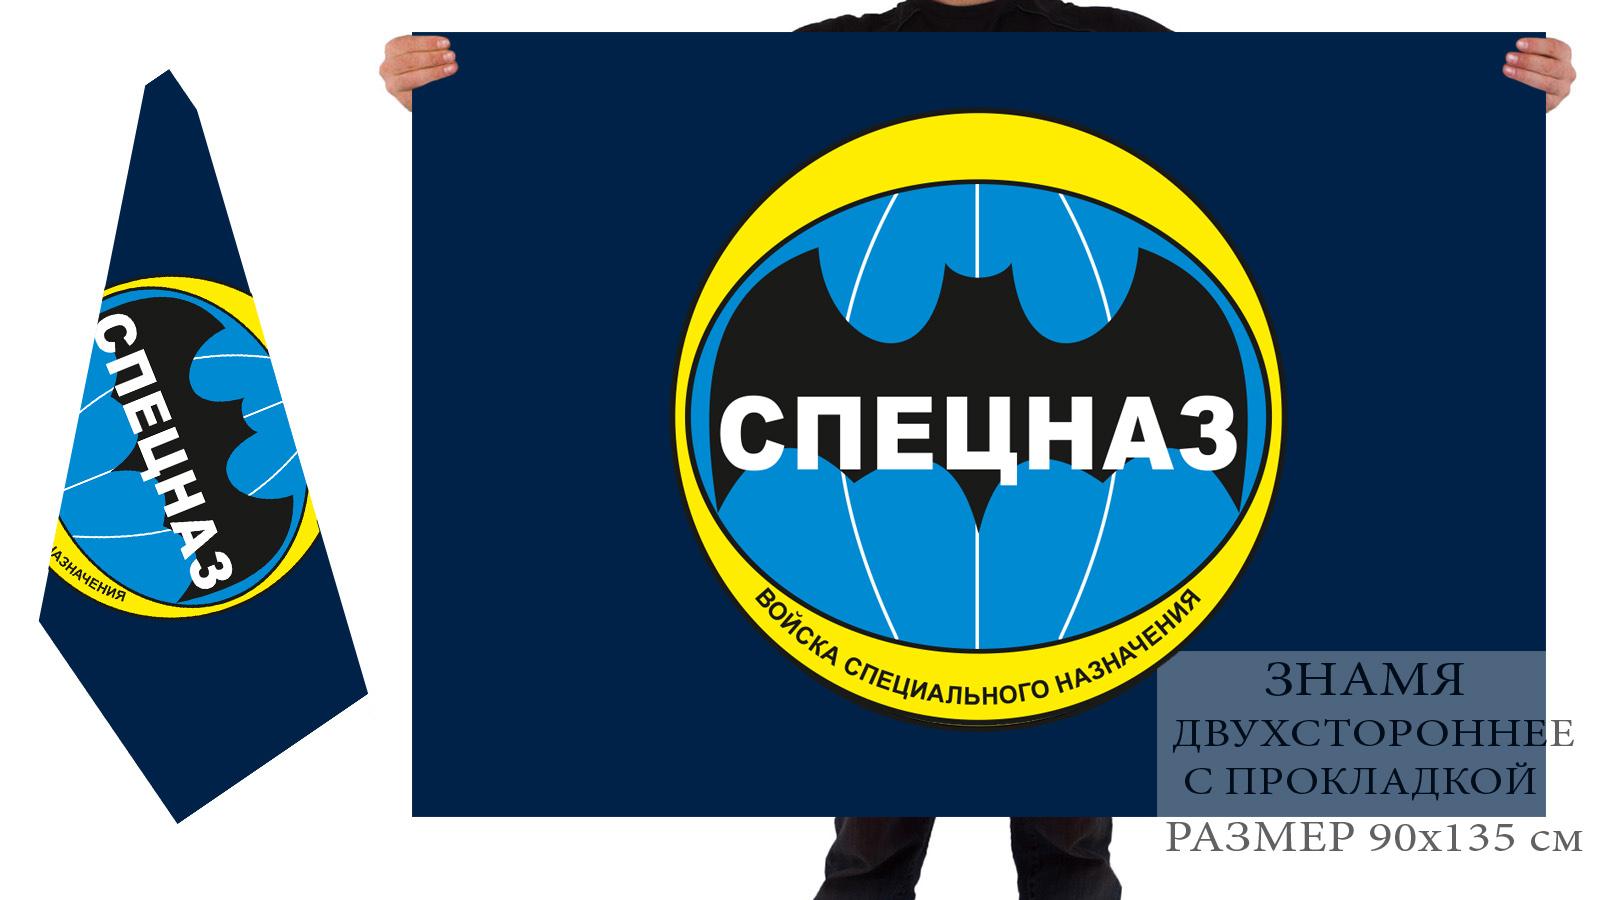 Двухсторонний флаг Военной разведки «Спецназ»